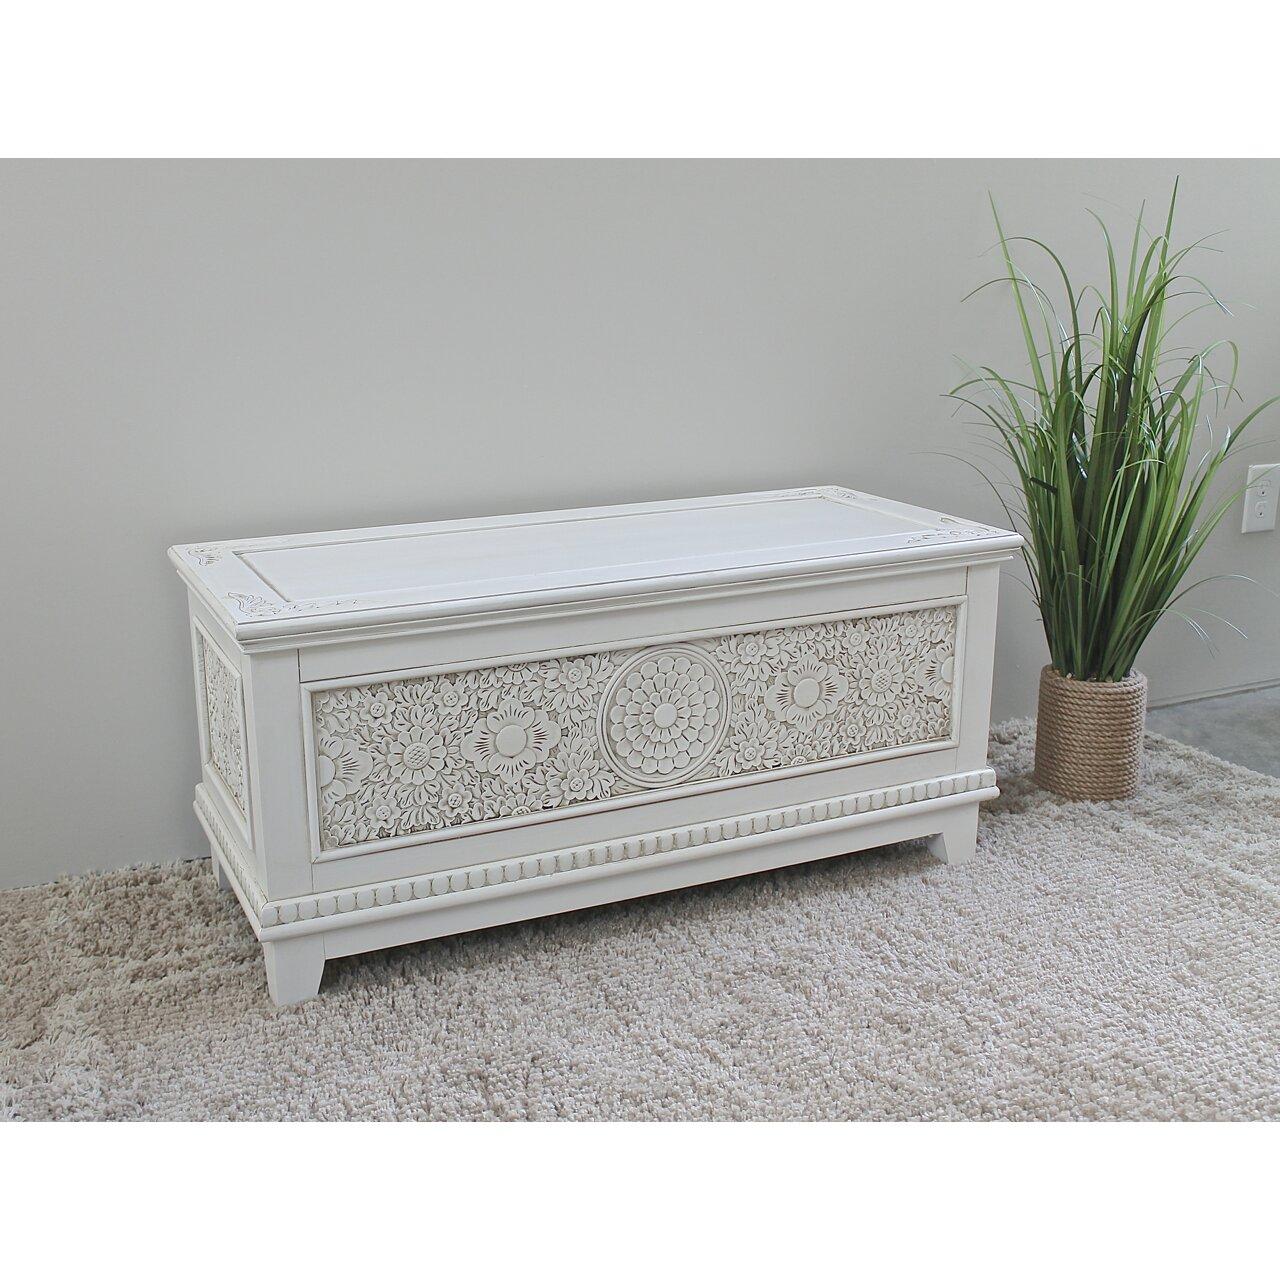 Bungalow Rose Navya Wood Storage Bedroom Bench Reviews: Bungalow Rose Moreira Wood Trunk & Reviews